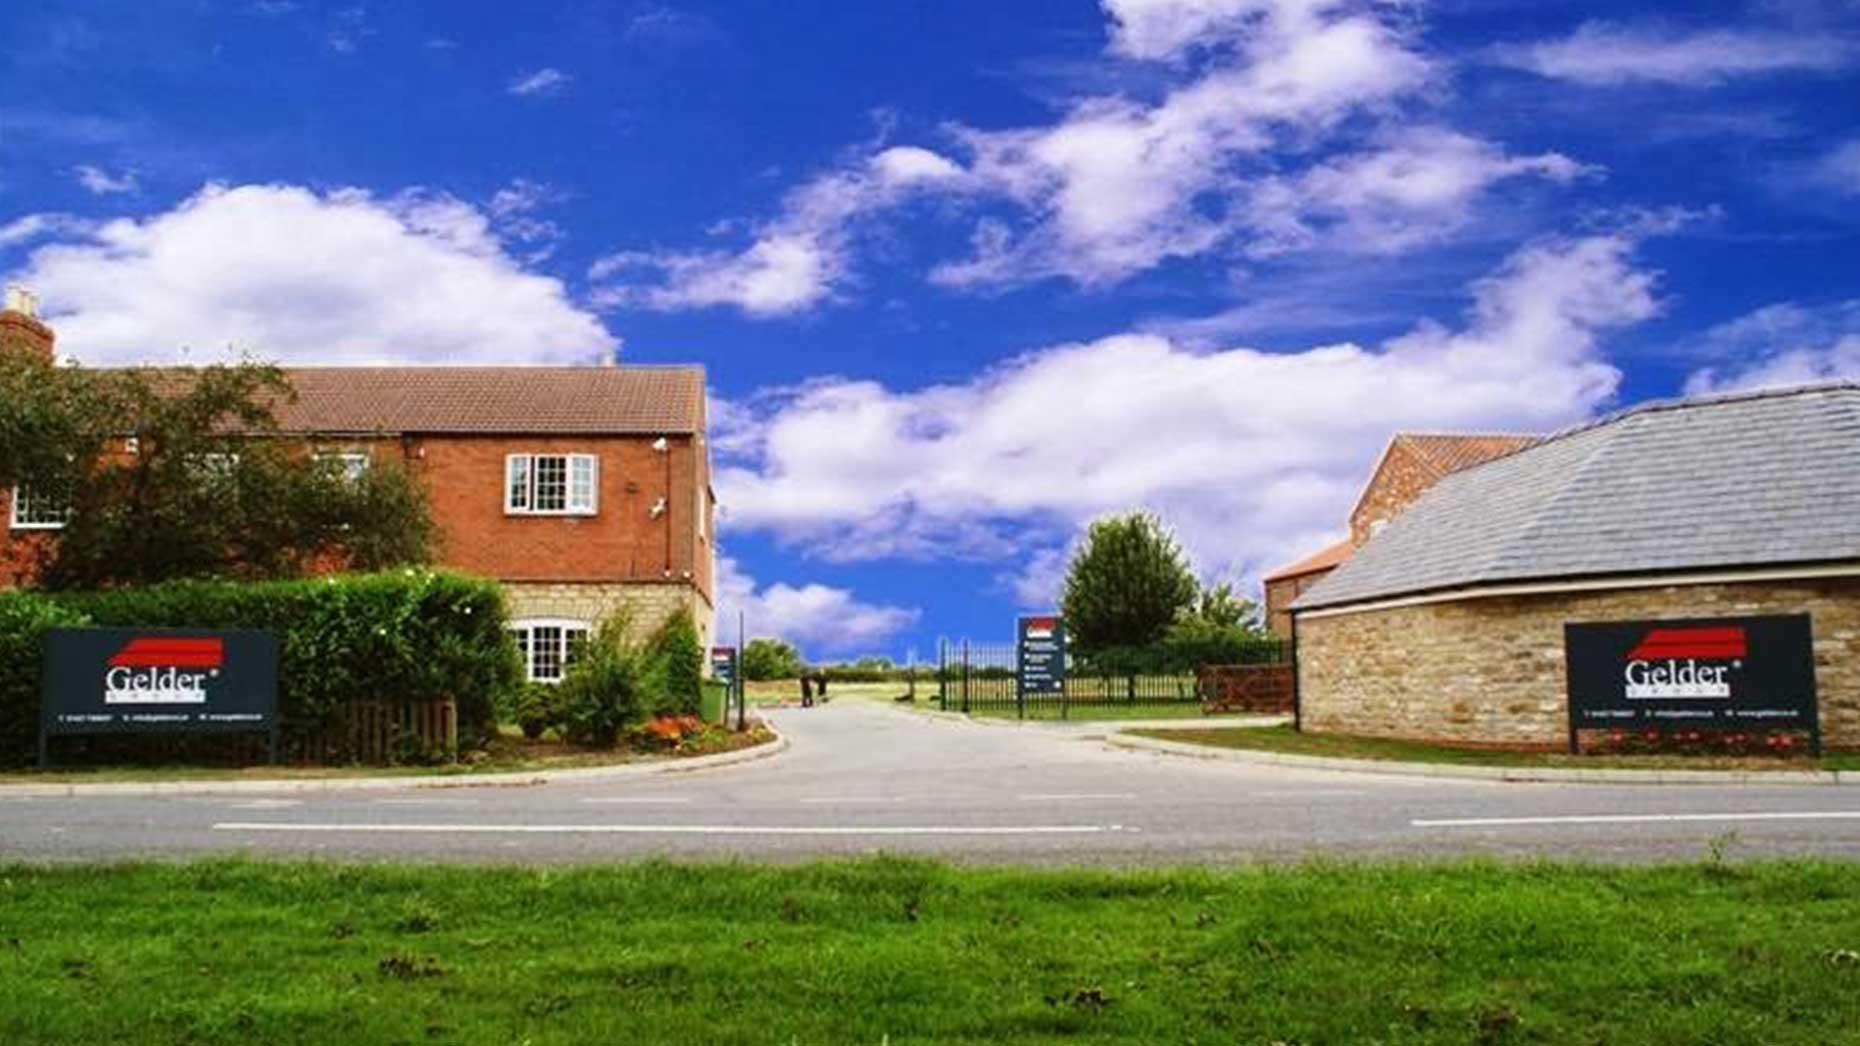 The Gelder Group head office on Tillbridge Lane in Sturton by Stow near Lincoln. Photo: Gelder Group